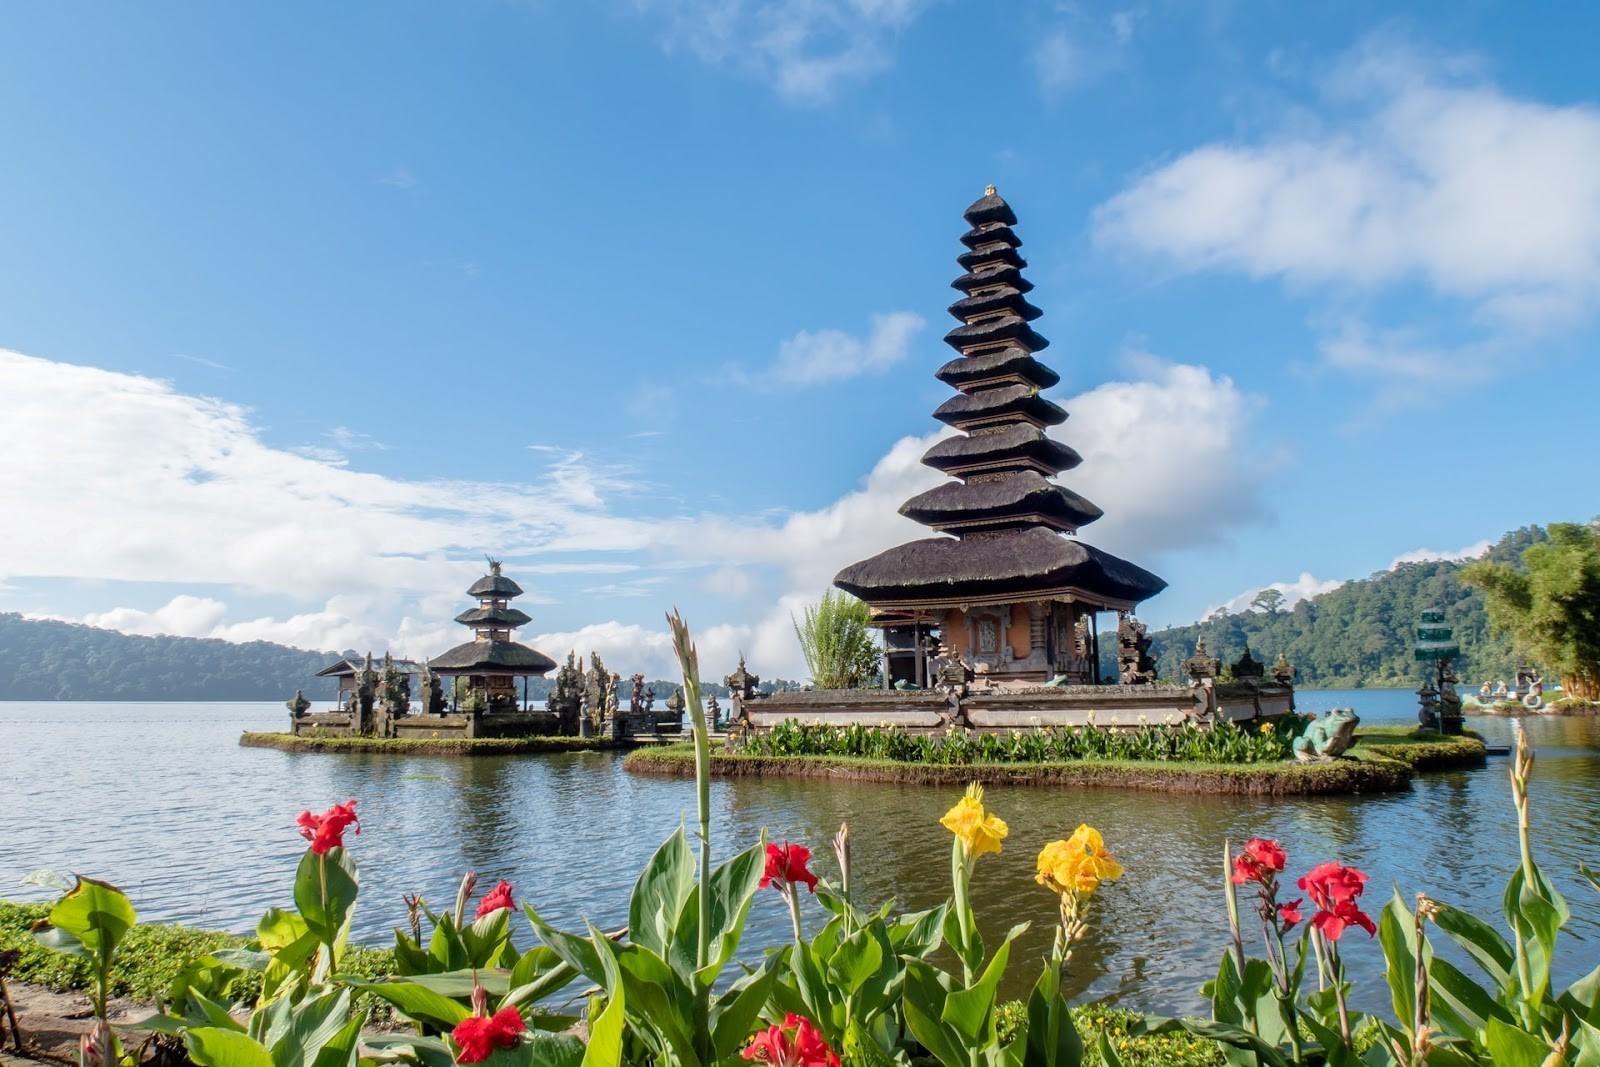 Beautiful temples of Bali, Indonesia